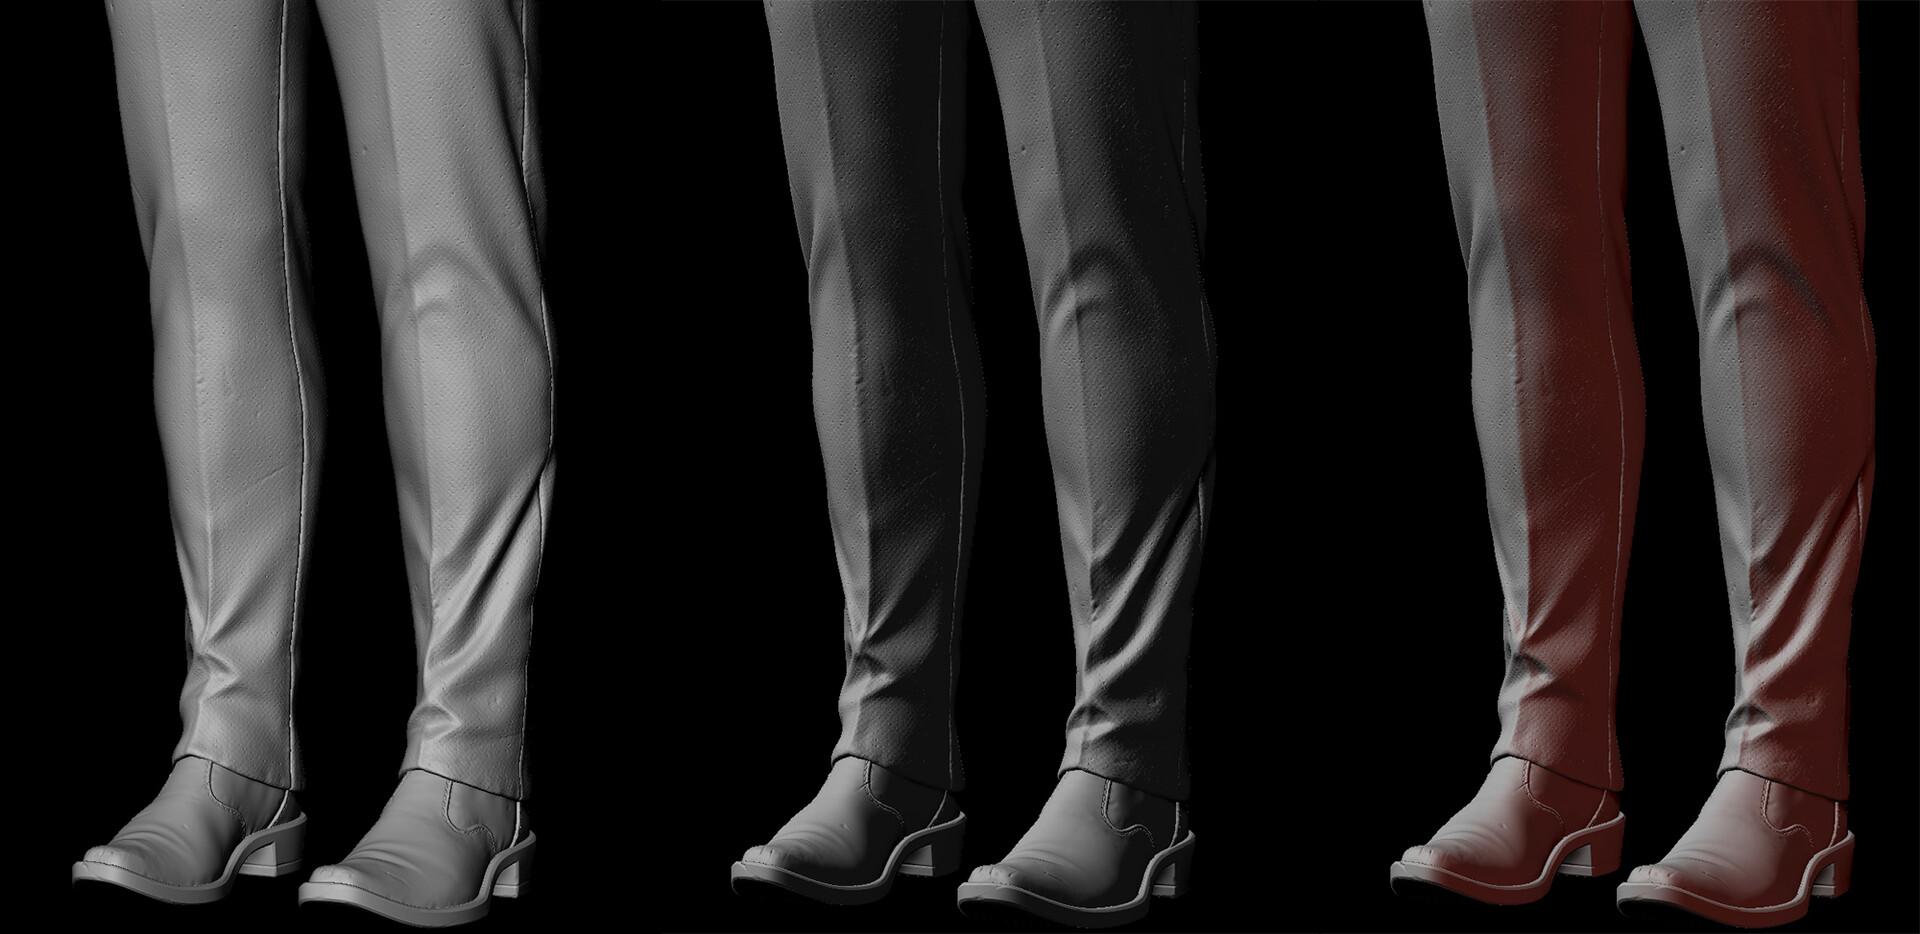 Loraine howard iii pants shoes